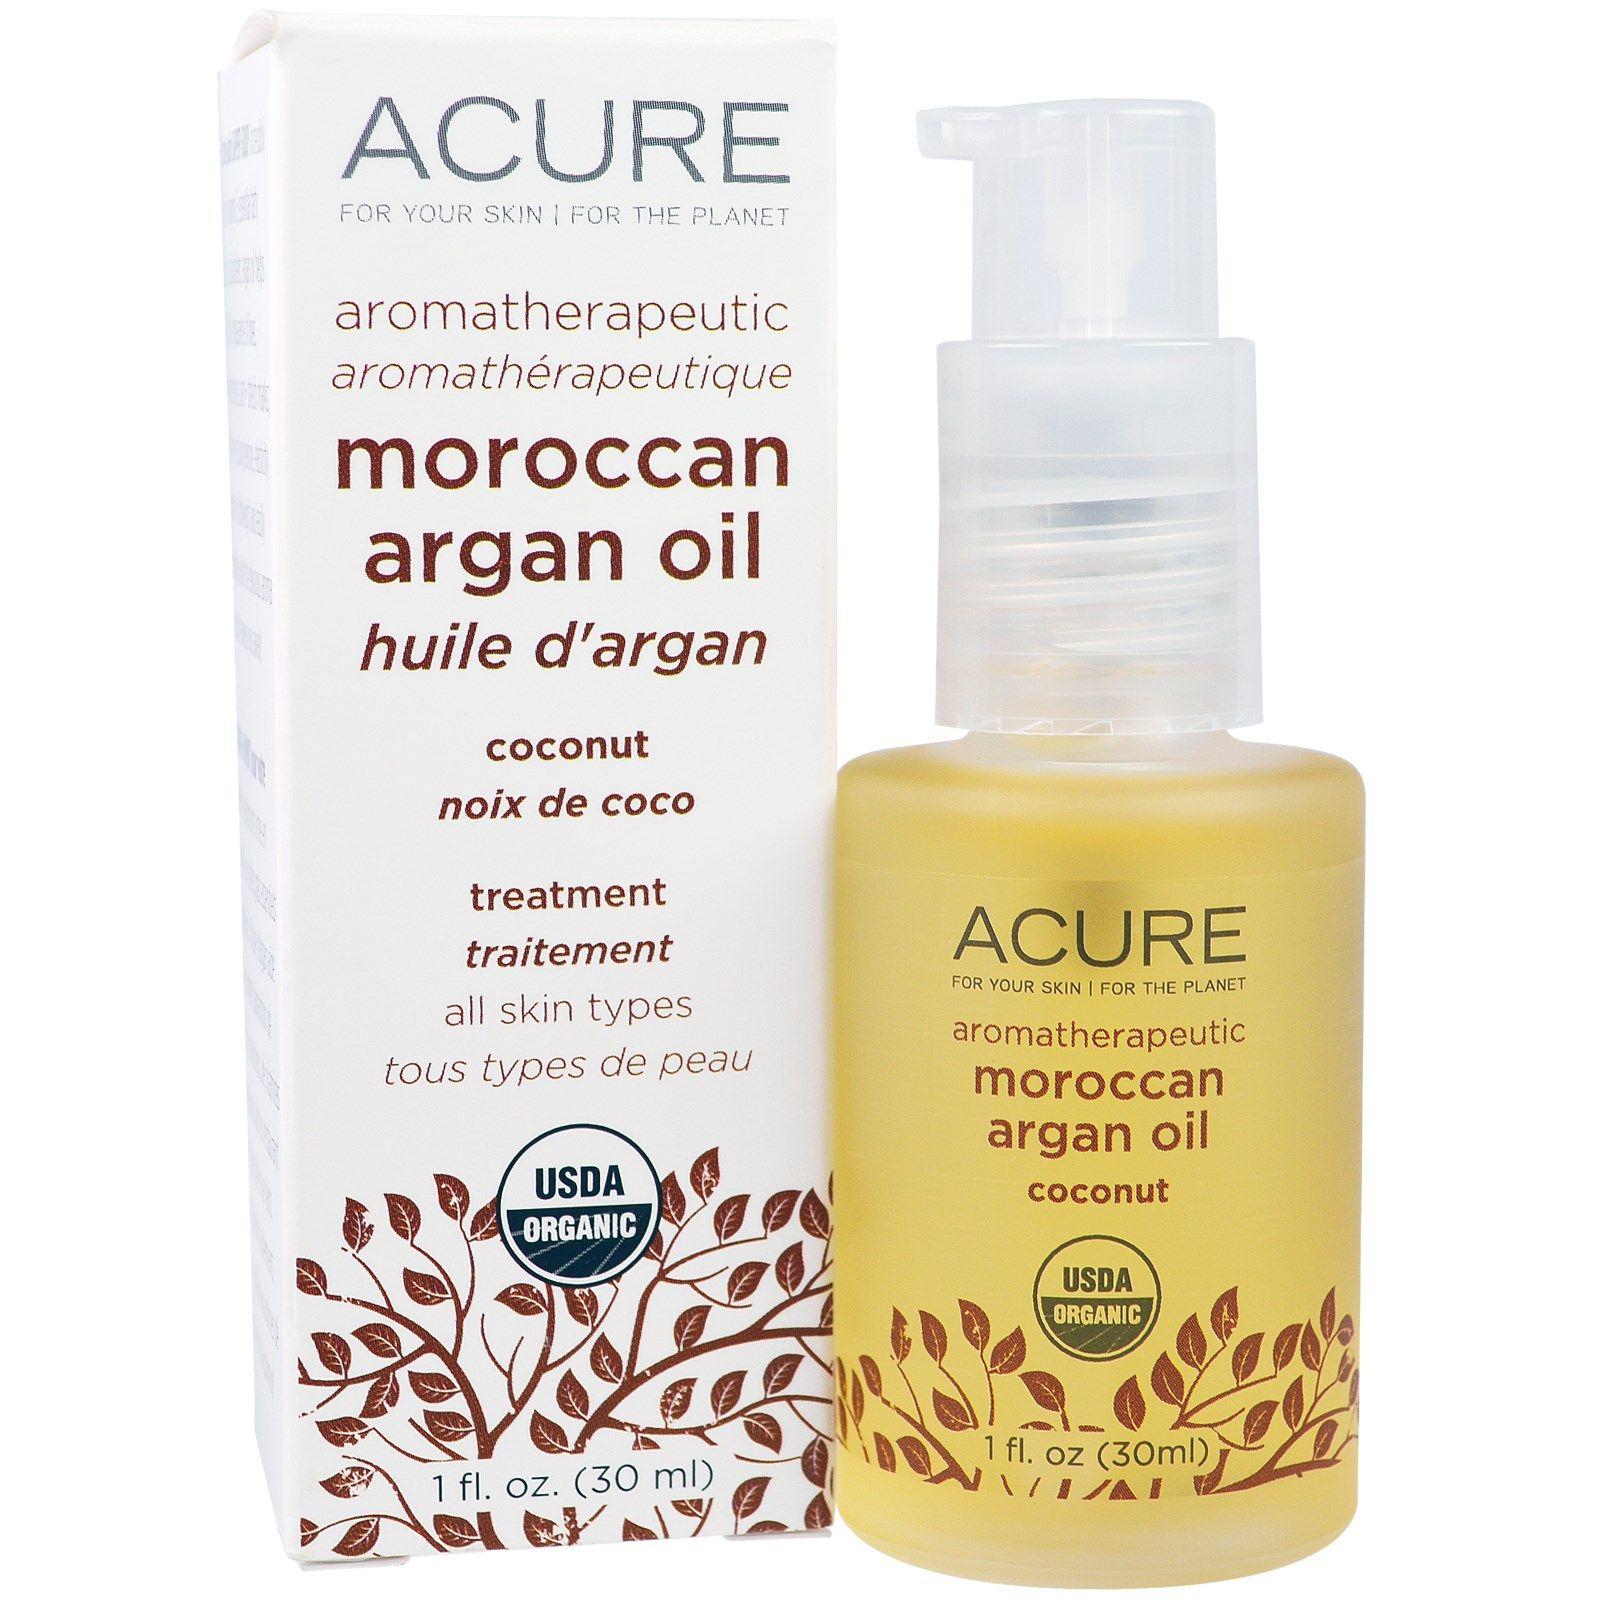 Acure Organics, Aromatherapeutic Moroccan Argan Oil, Coconut